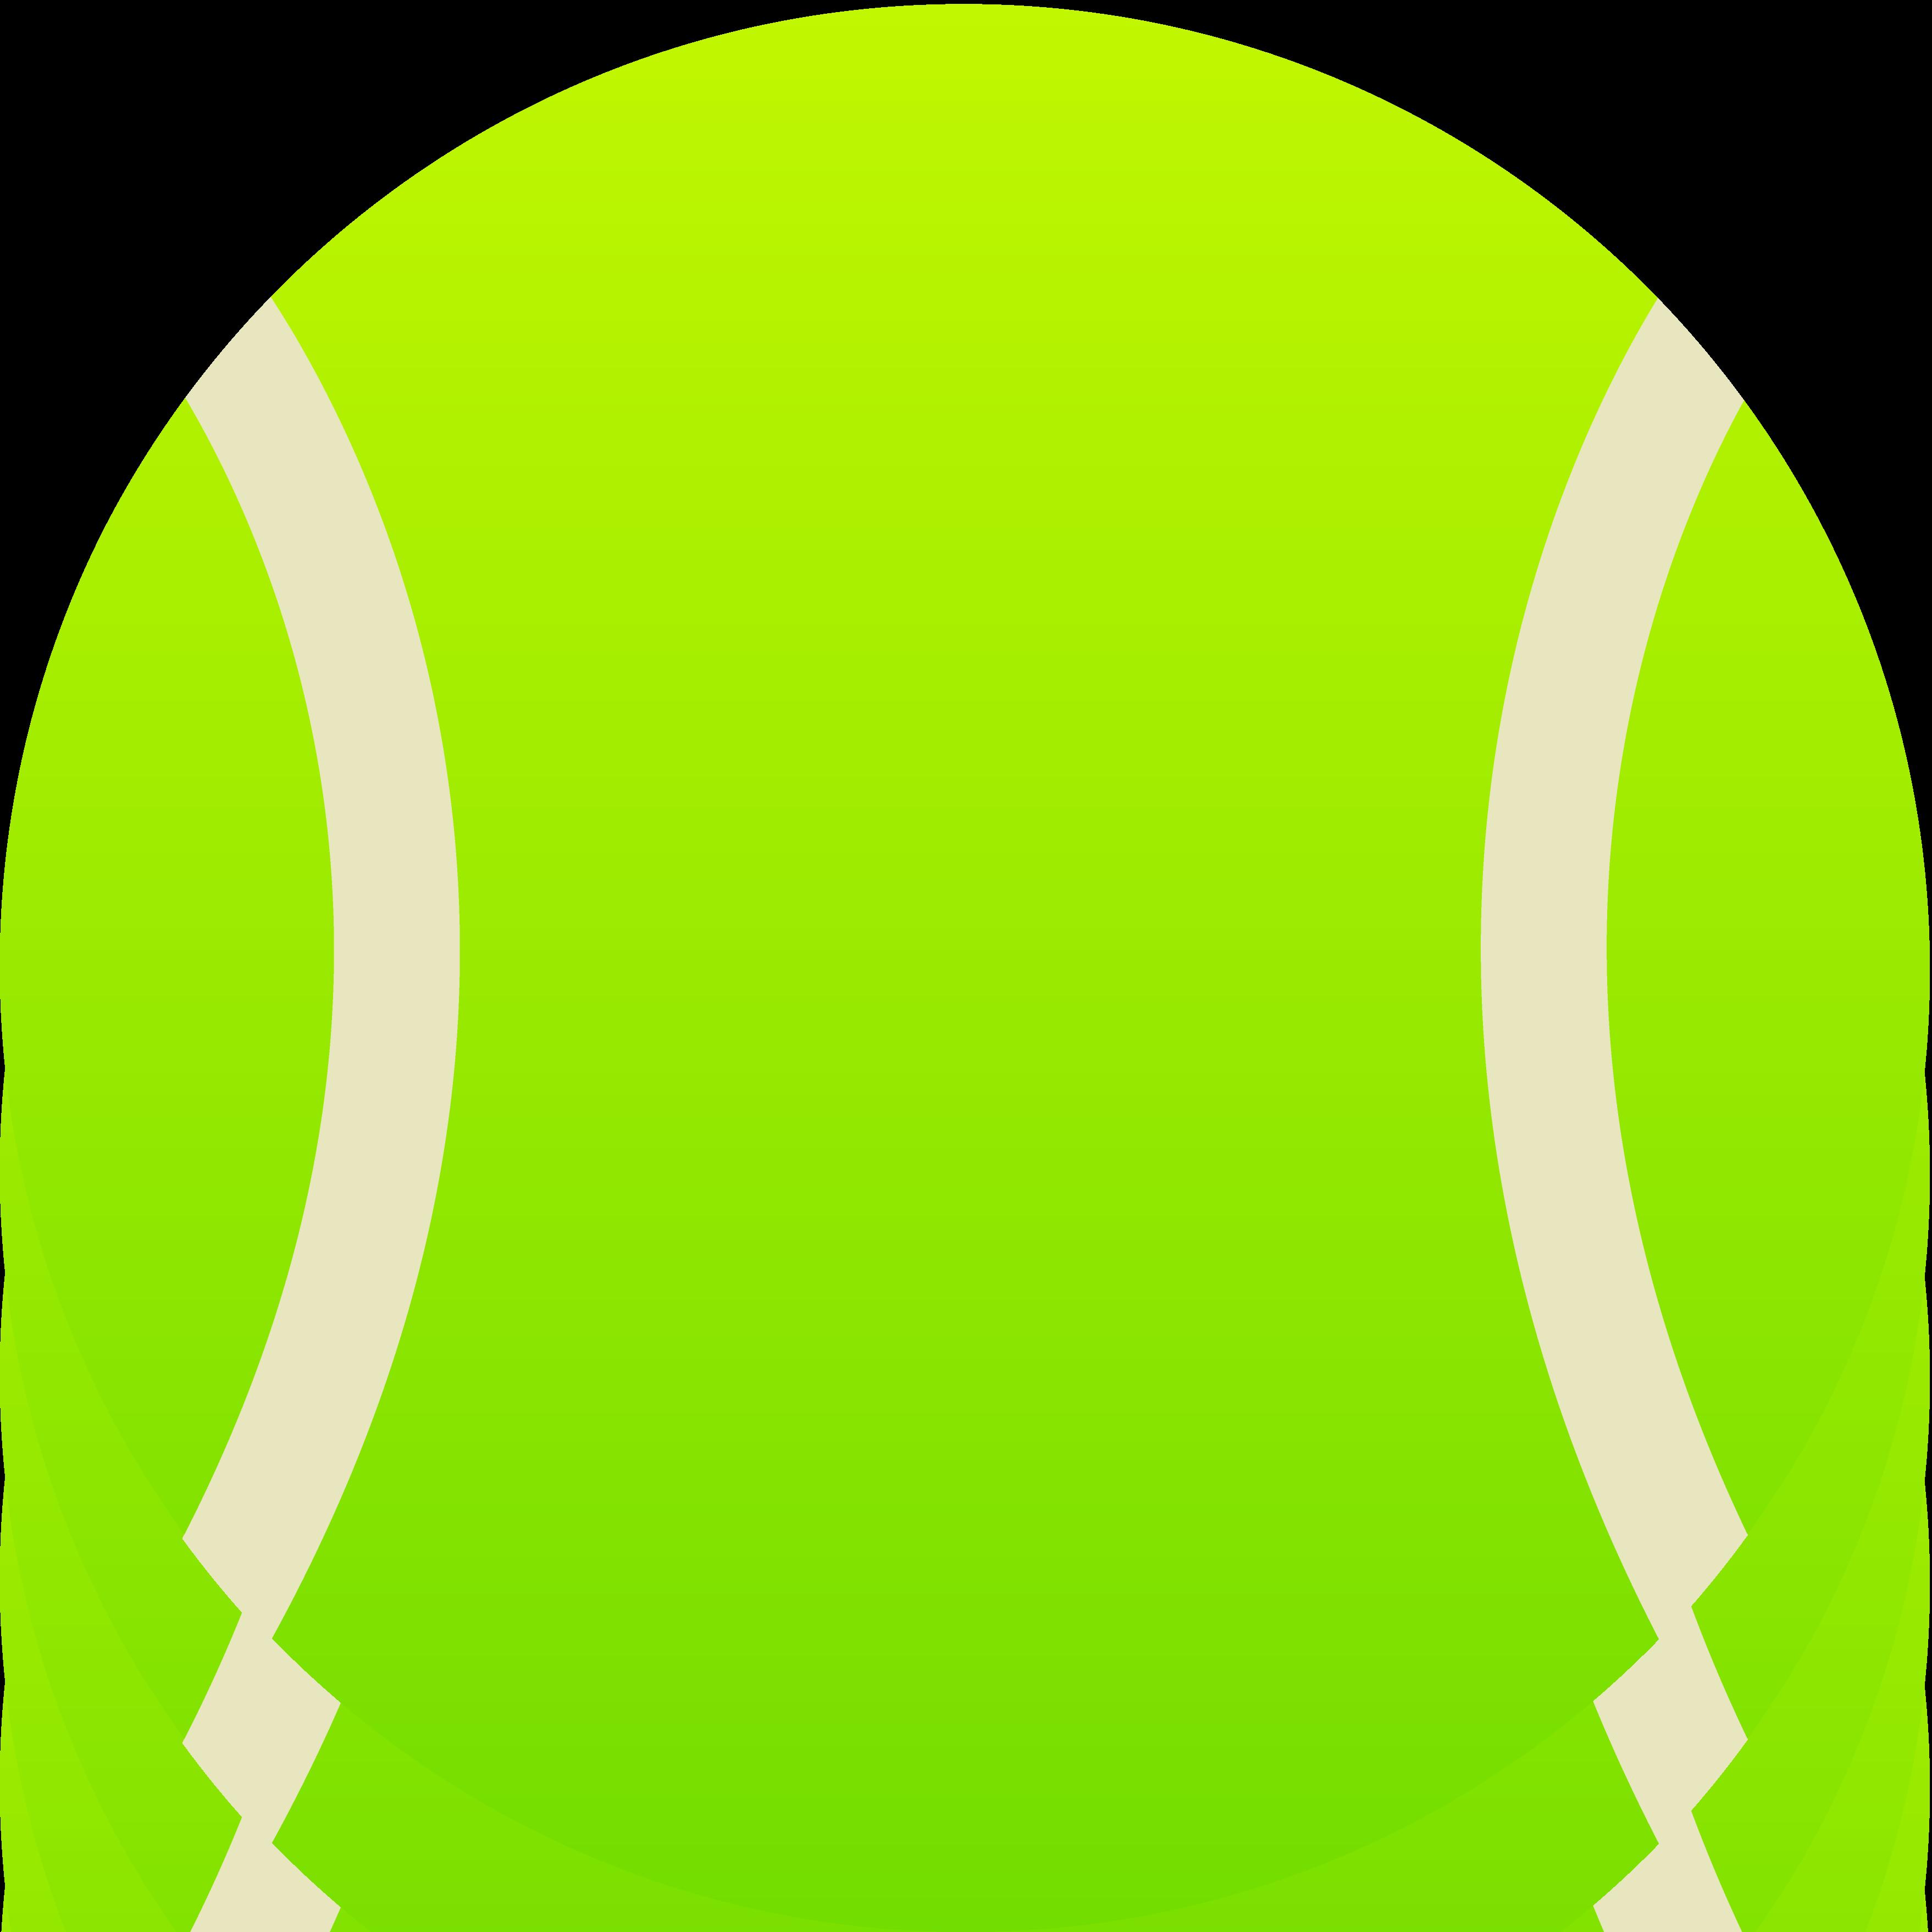 3515x3515 Tennis Ball Clip Art